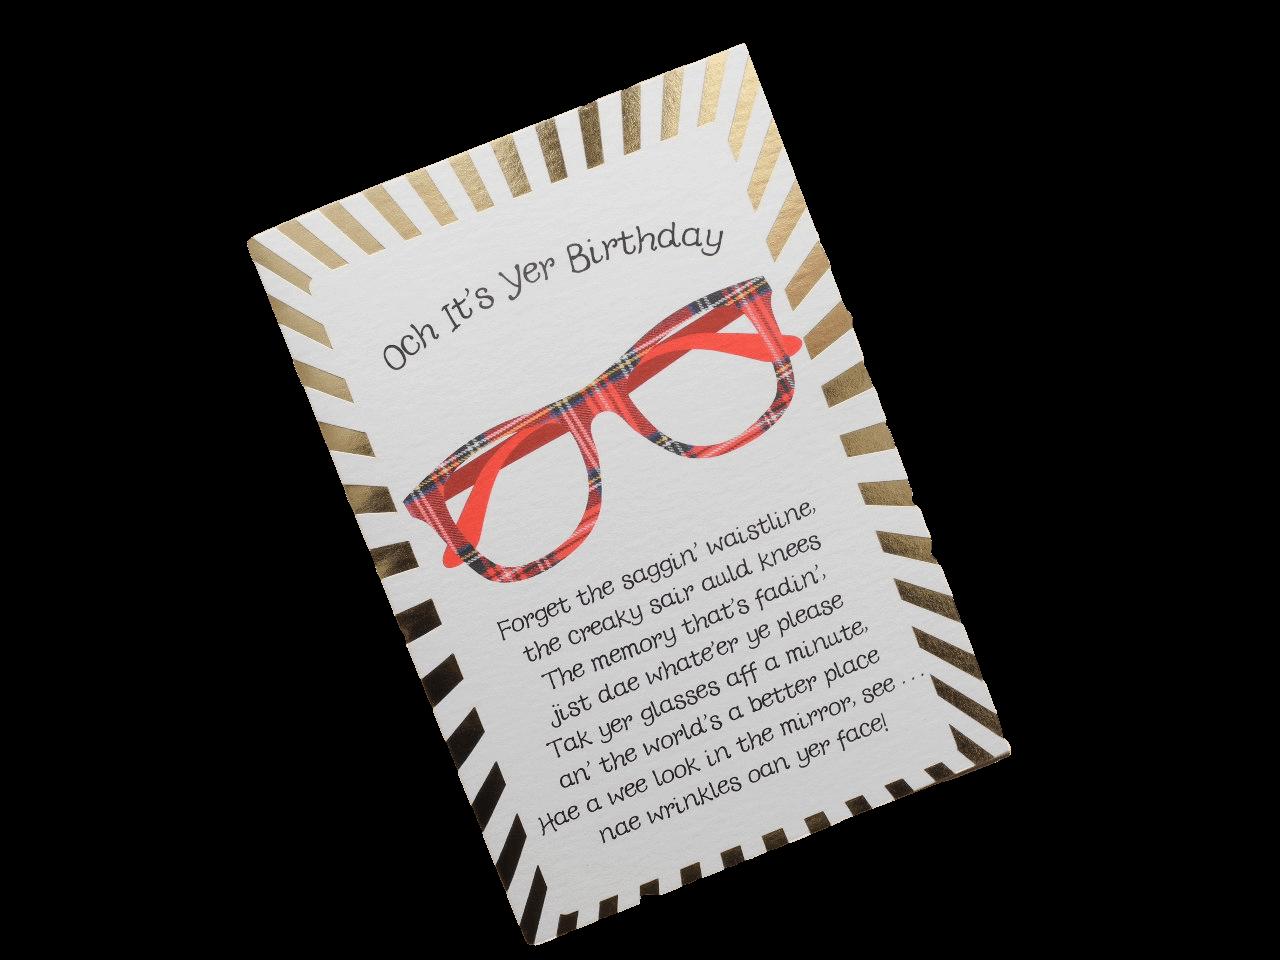 scottish birthday card tartan specs glasses scots doric language funny verse